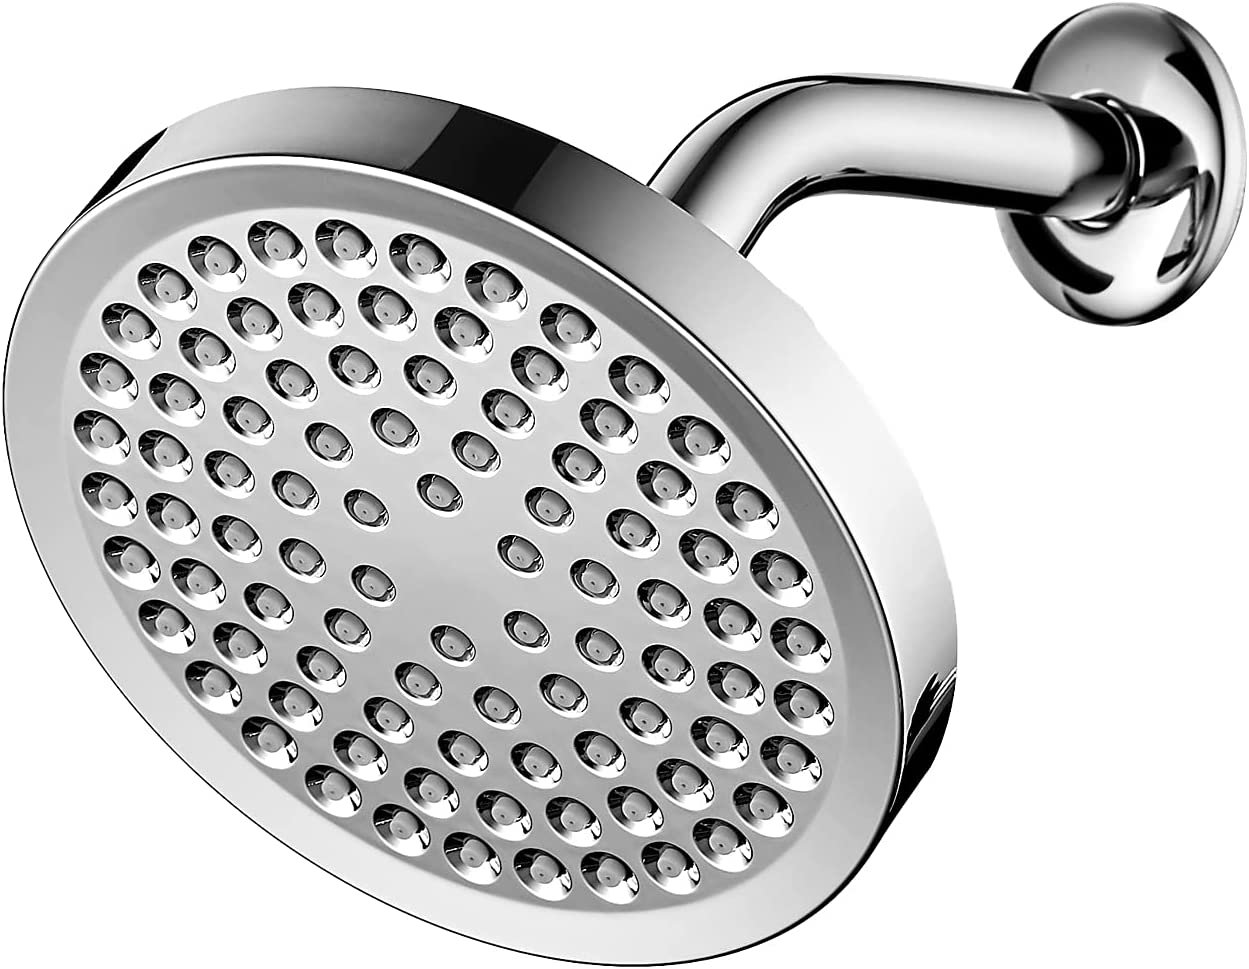 Shower Head High Pressure Rain Cheap super special price Bathroom Showerhea Modern Luxury Clearance SALE! Limited time!